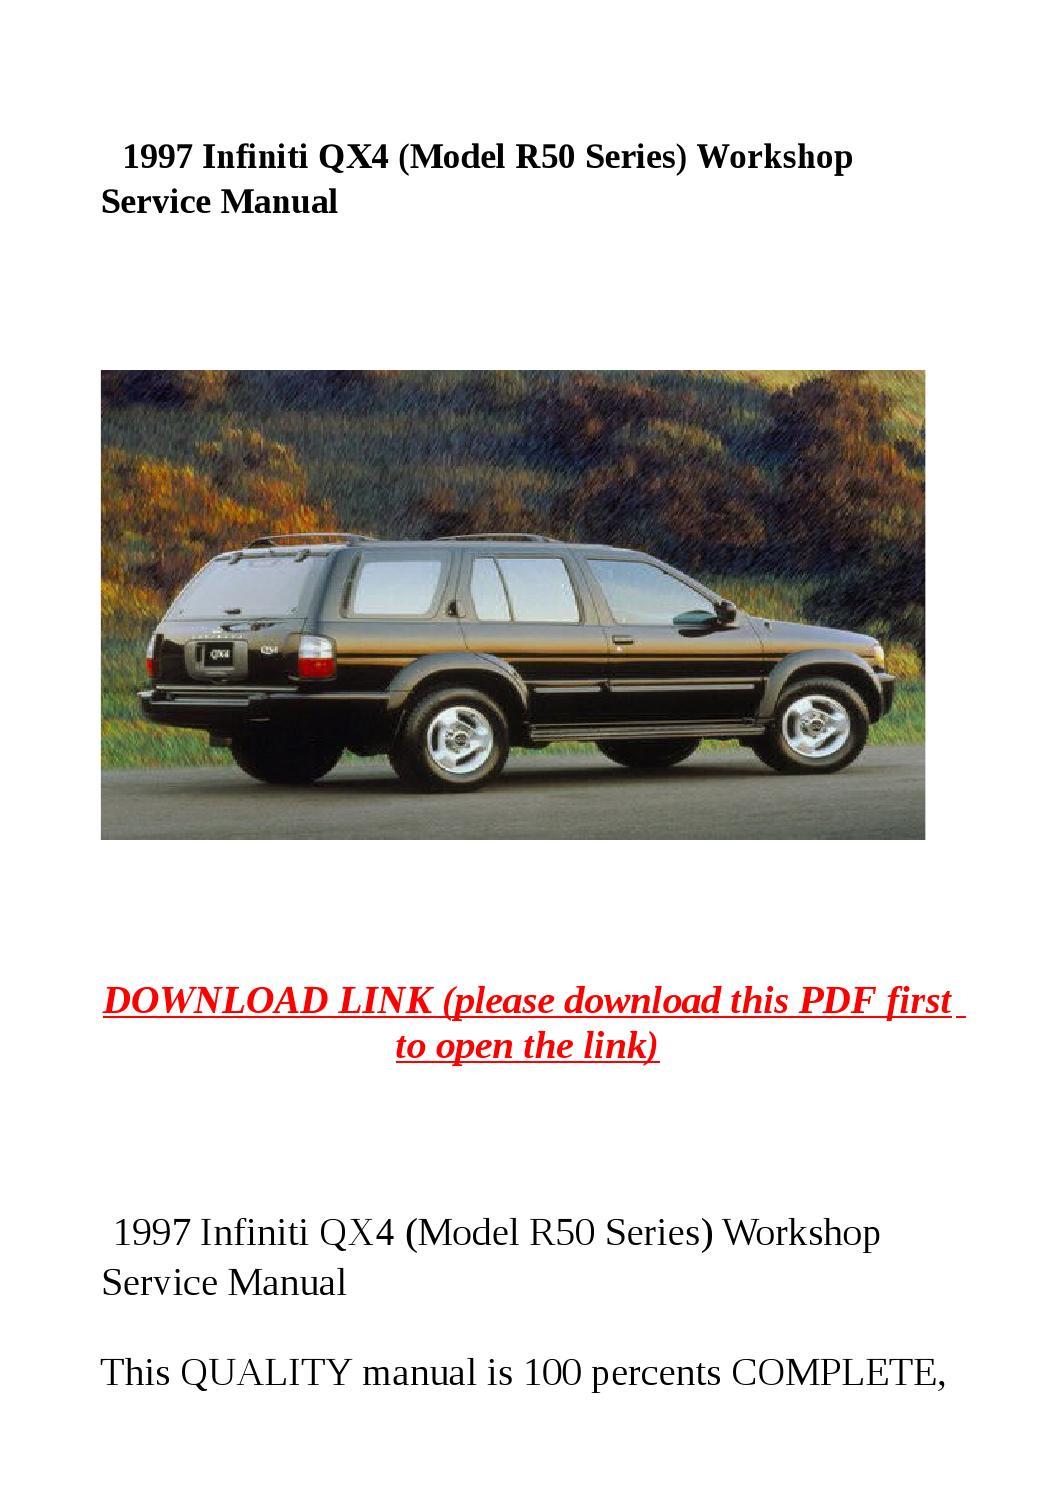 service manual 1997 infiniti qx repair manual free. Black Bedroom Furniture Sets. Home Design Ideas